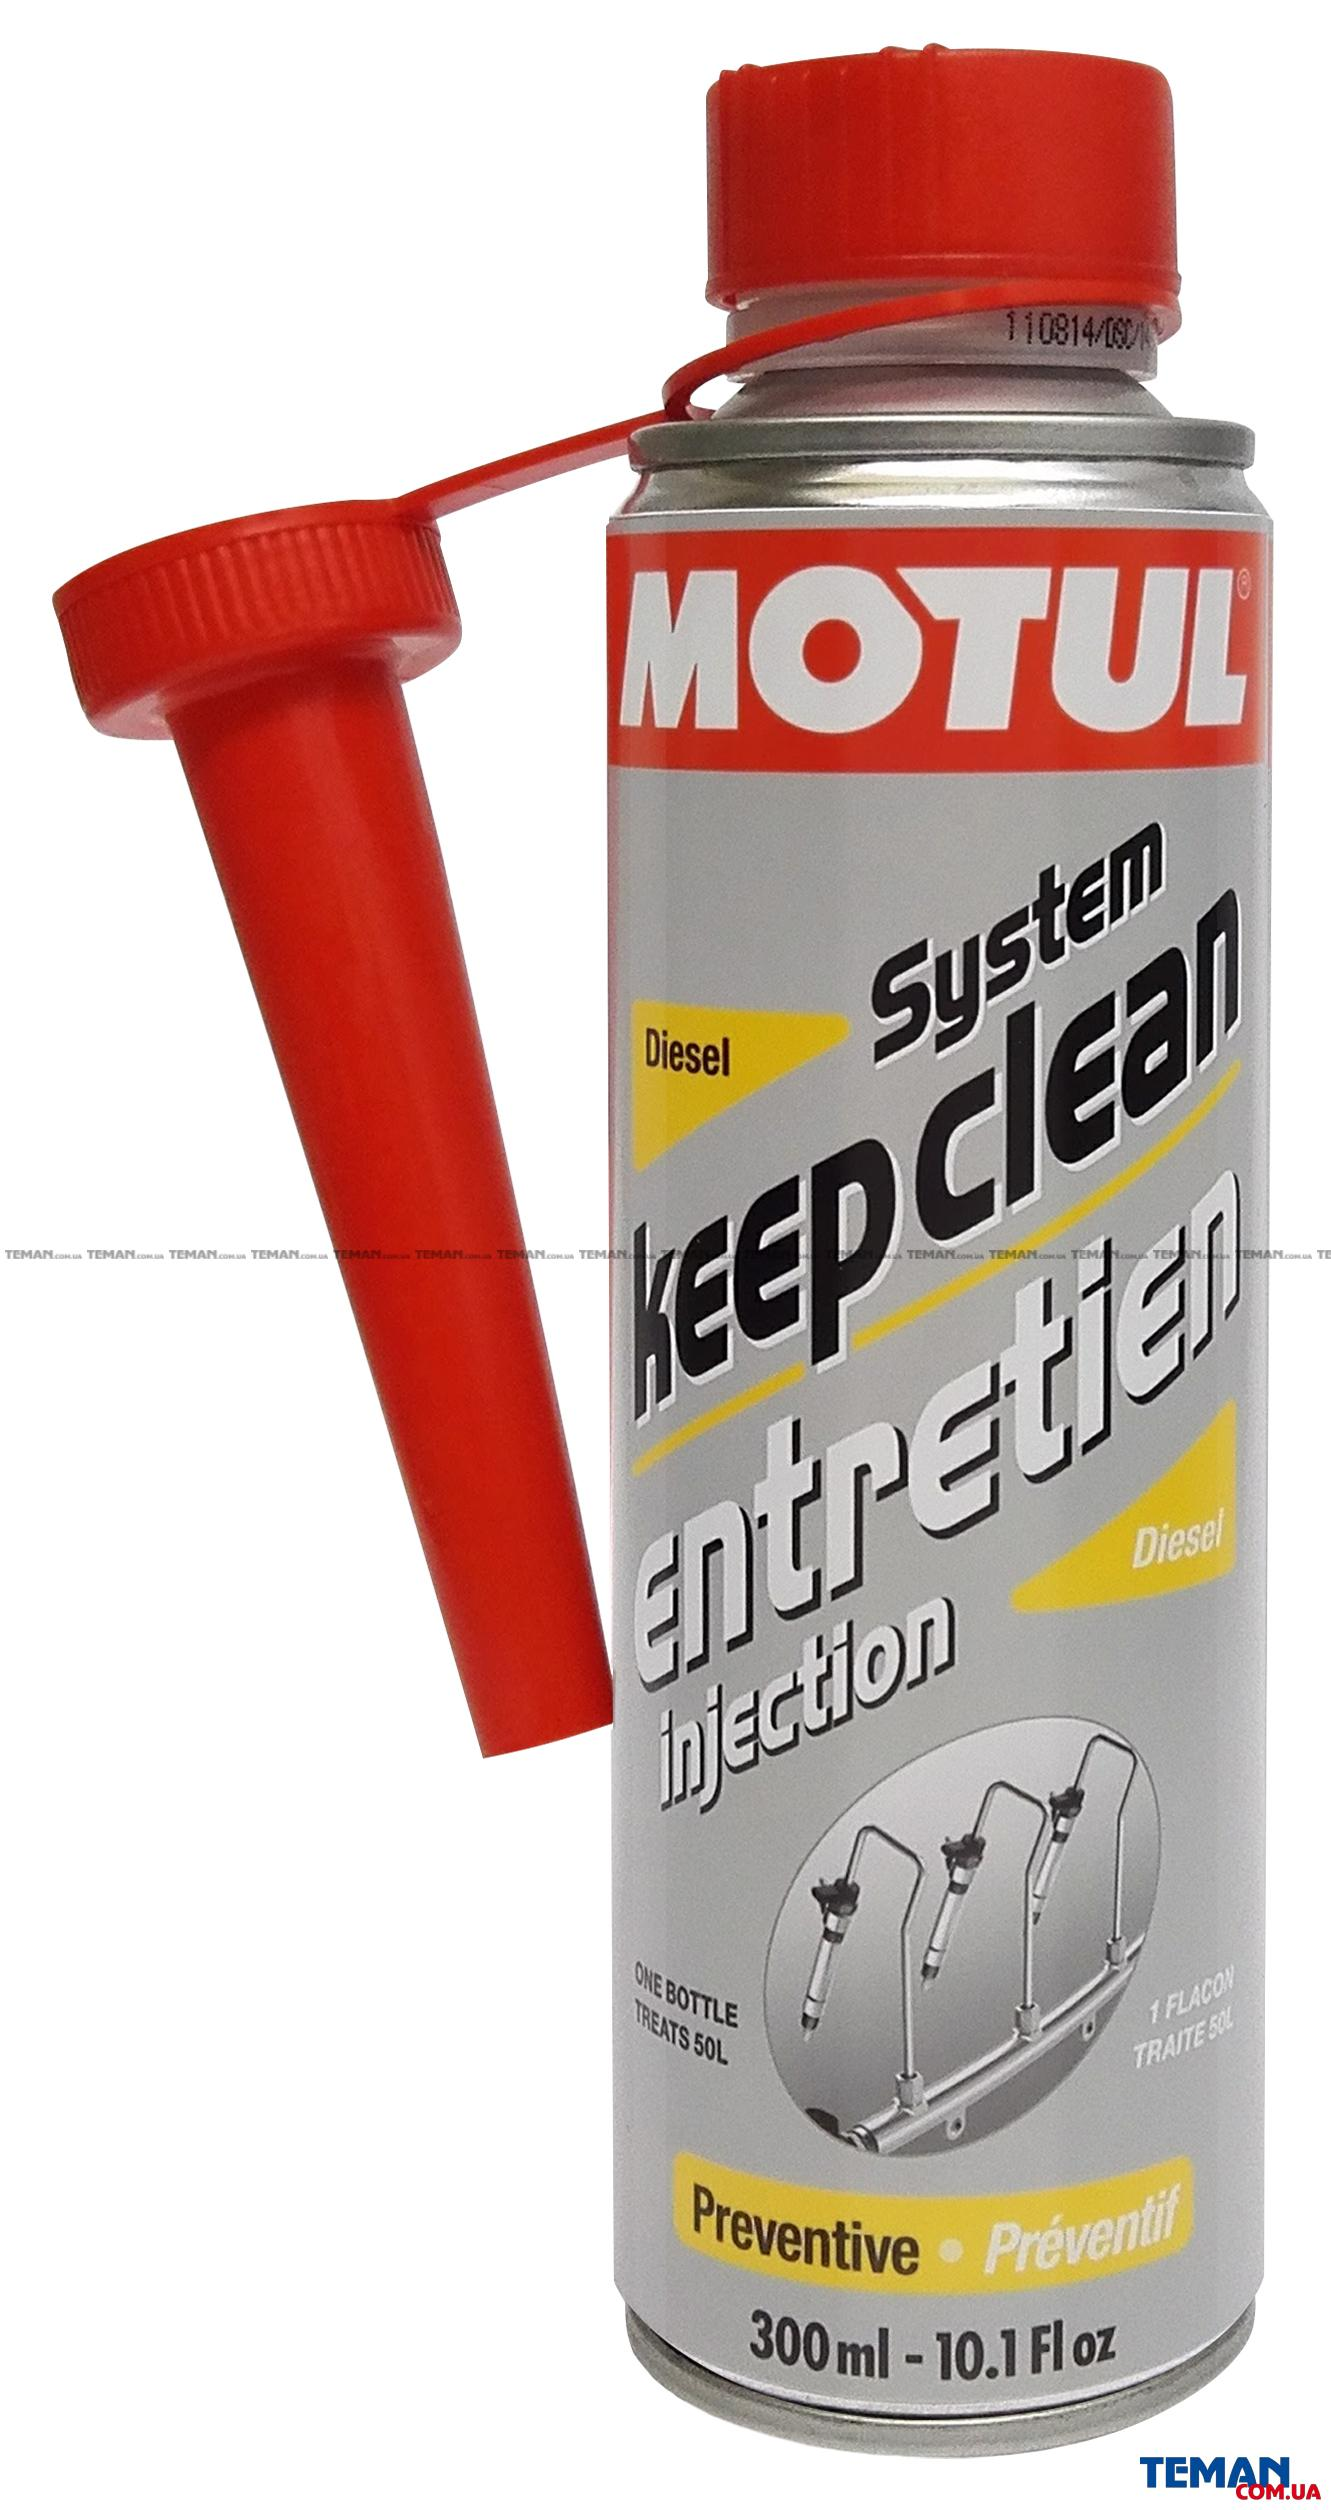 MOTUL System Keep Clean Diesel (300ml)